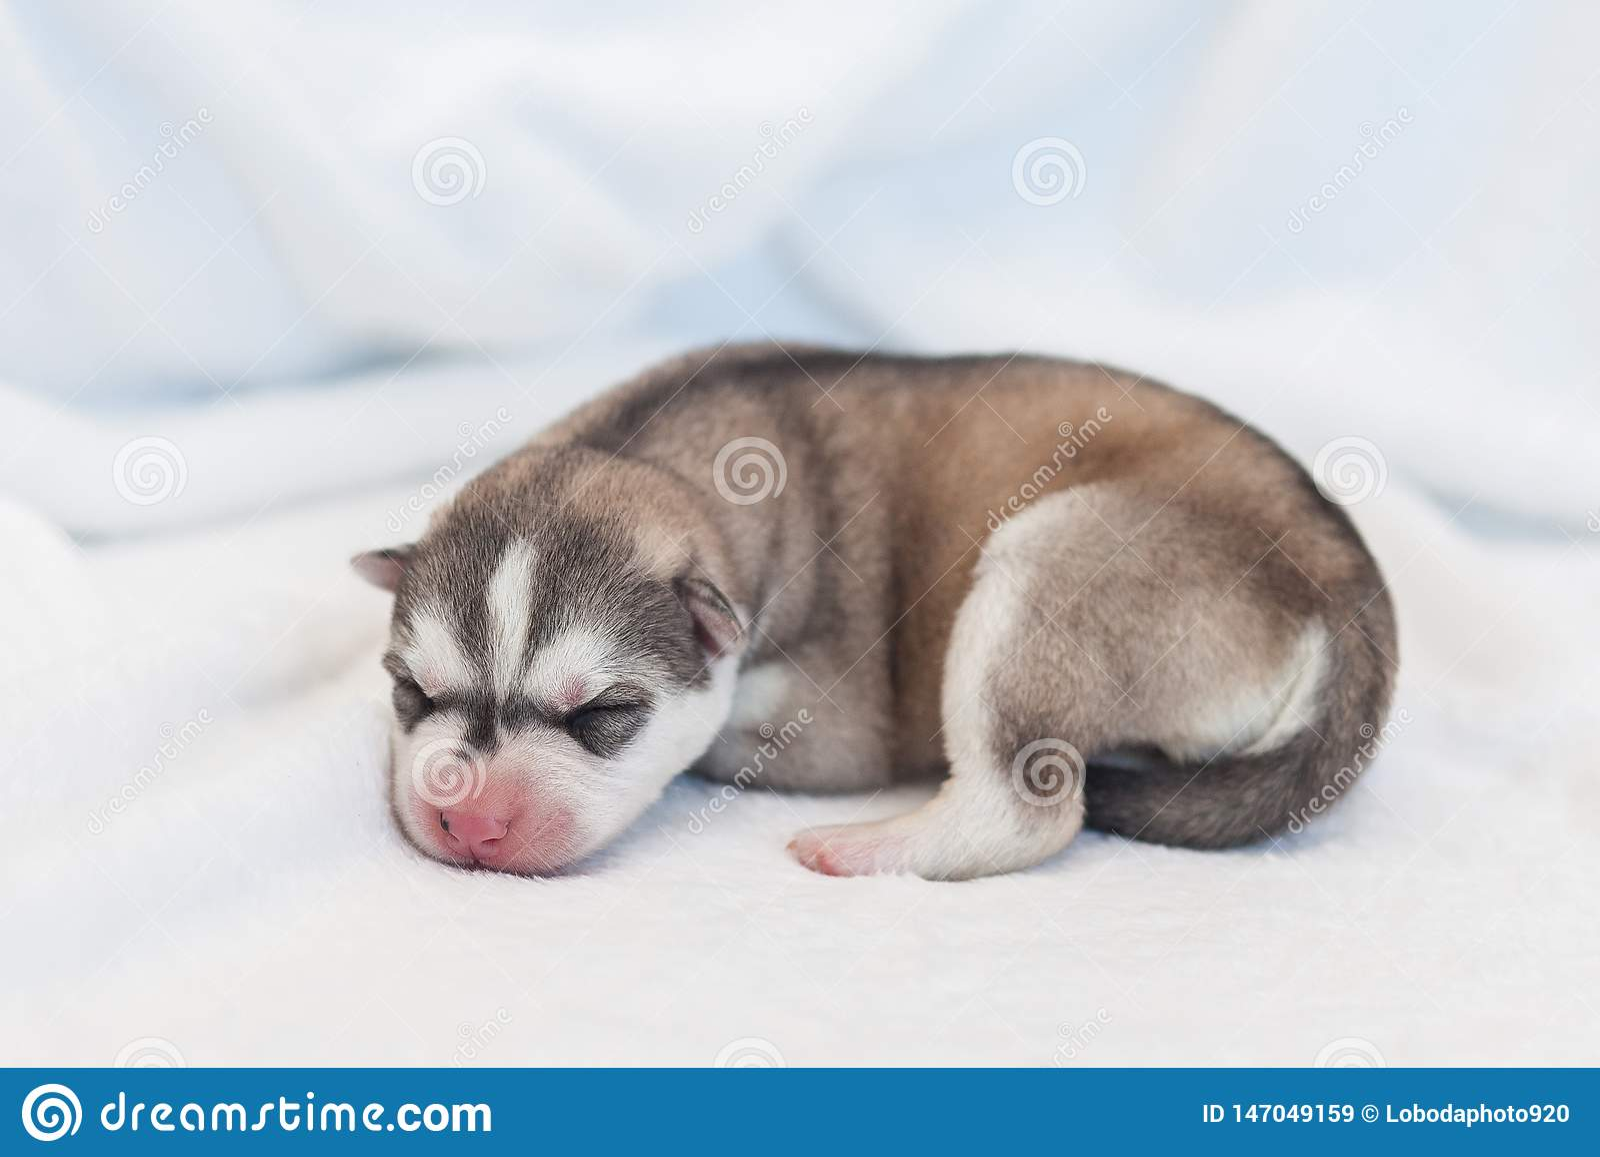 Husky Newborn Puppies 1 Day Stock Image Image Of Friend